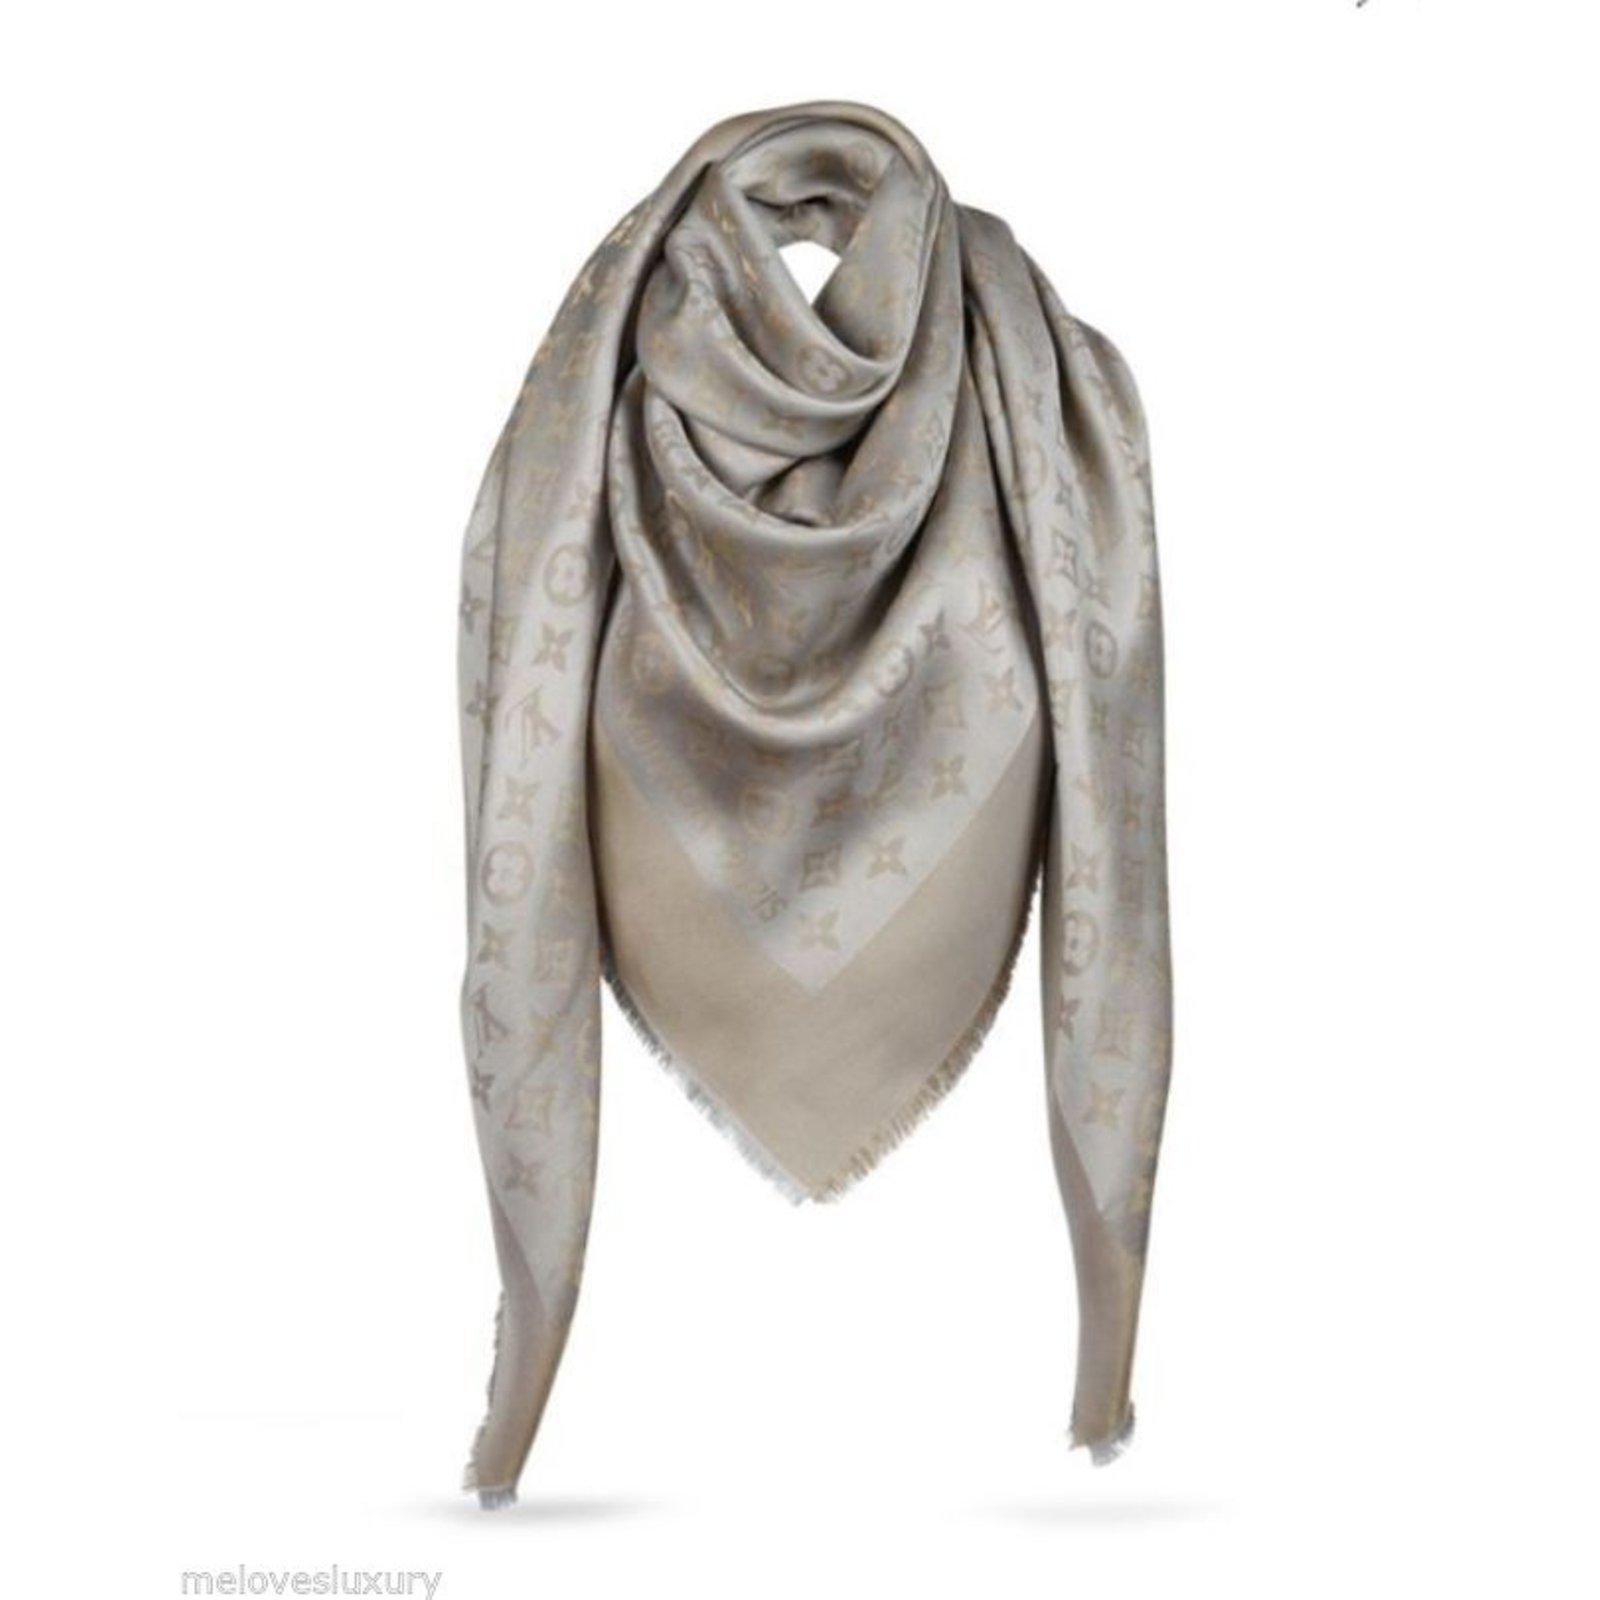 6993f77b61d2 Louis Vuitton Classical Monogram Scarf Scarves Silk Beige ref.47818 ...